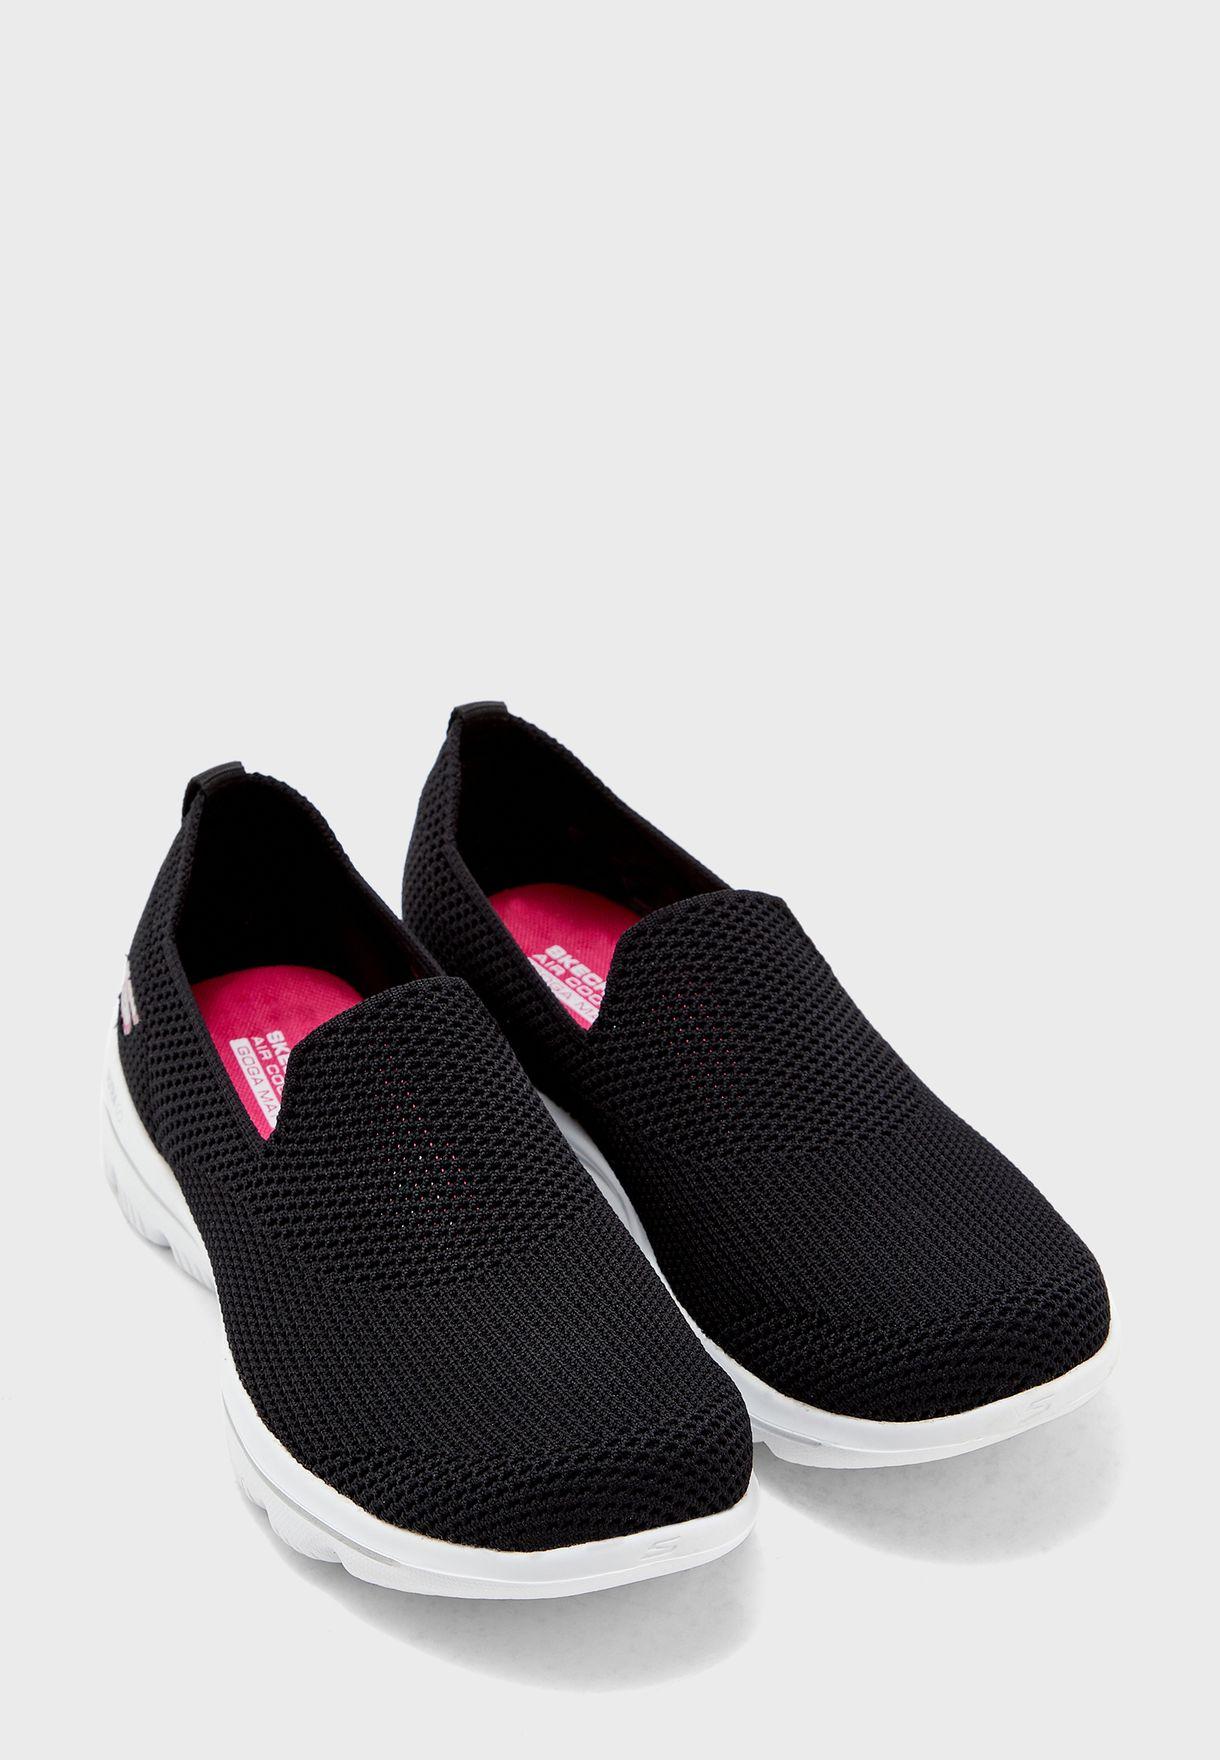 حذاء جو ووك ايفليوشن الترا